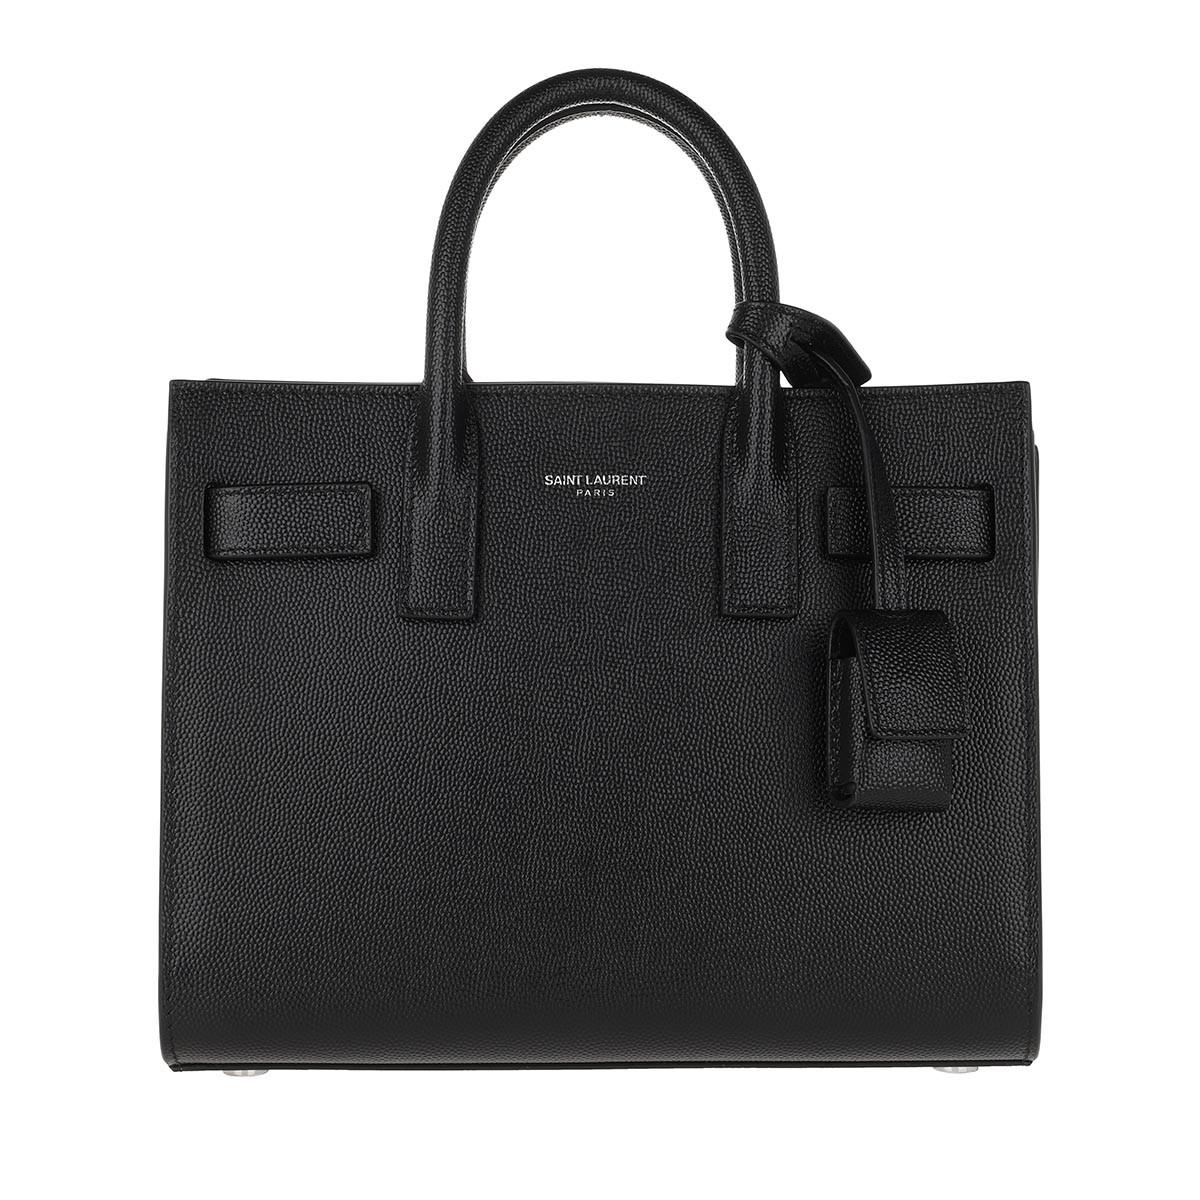 Saint Laurent Tote - Classic Sac De Jour Nano Leather Black - in schwarz - für Damen